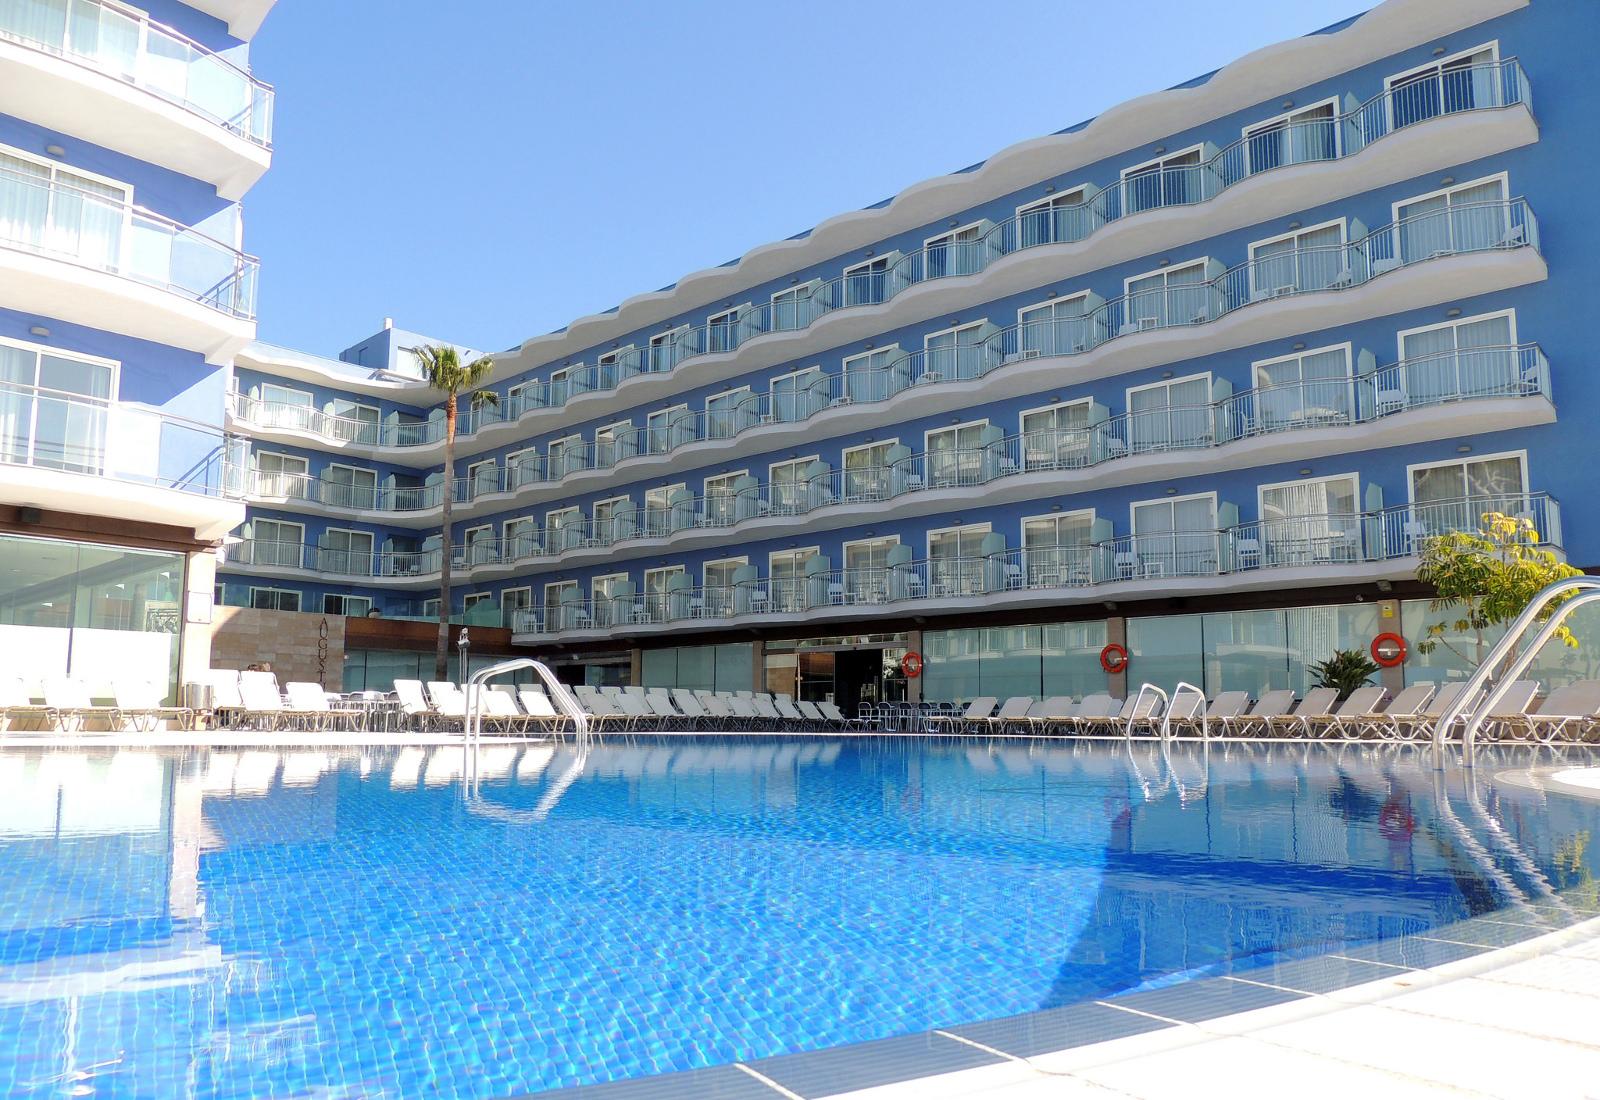 piscina viviendas turisticas vacacionales augustus